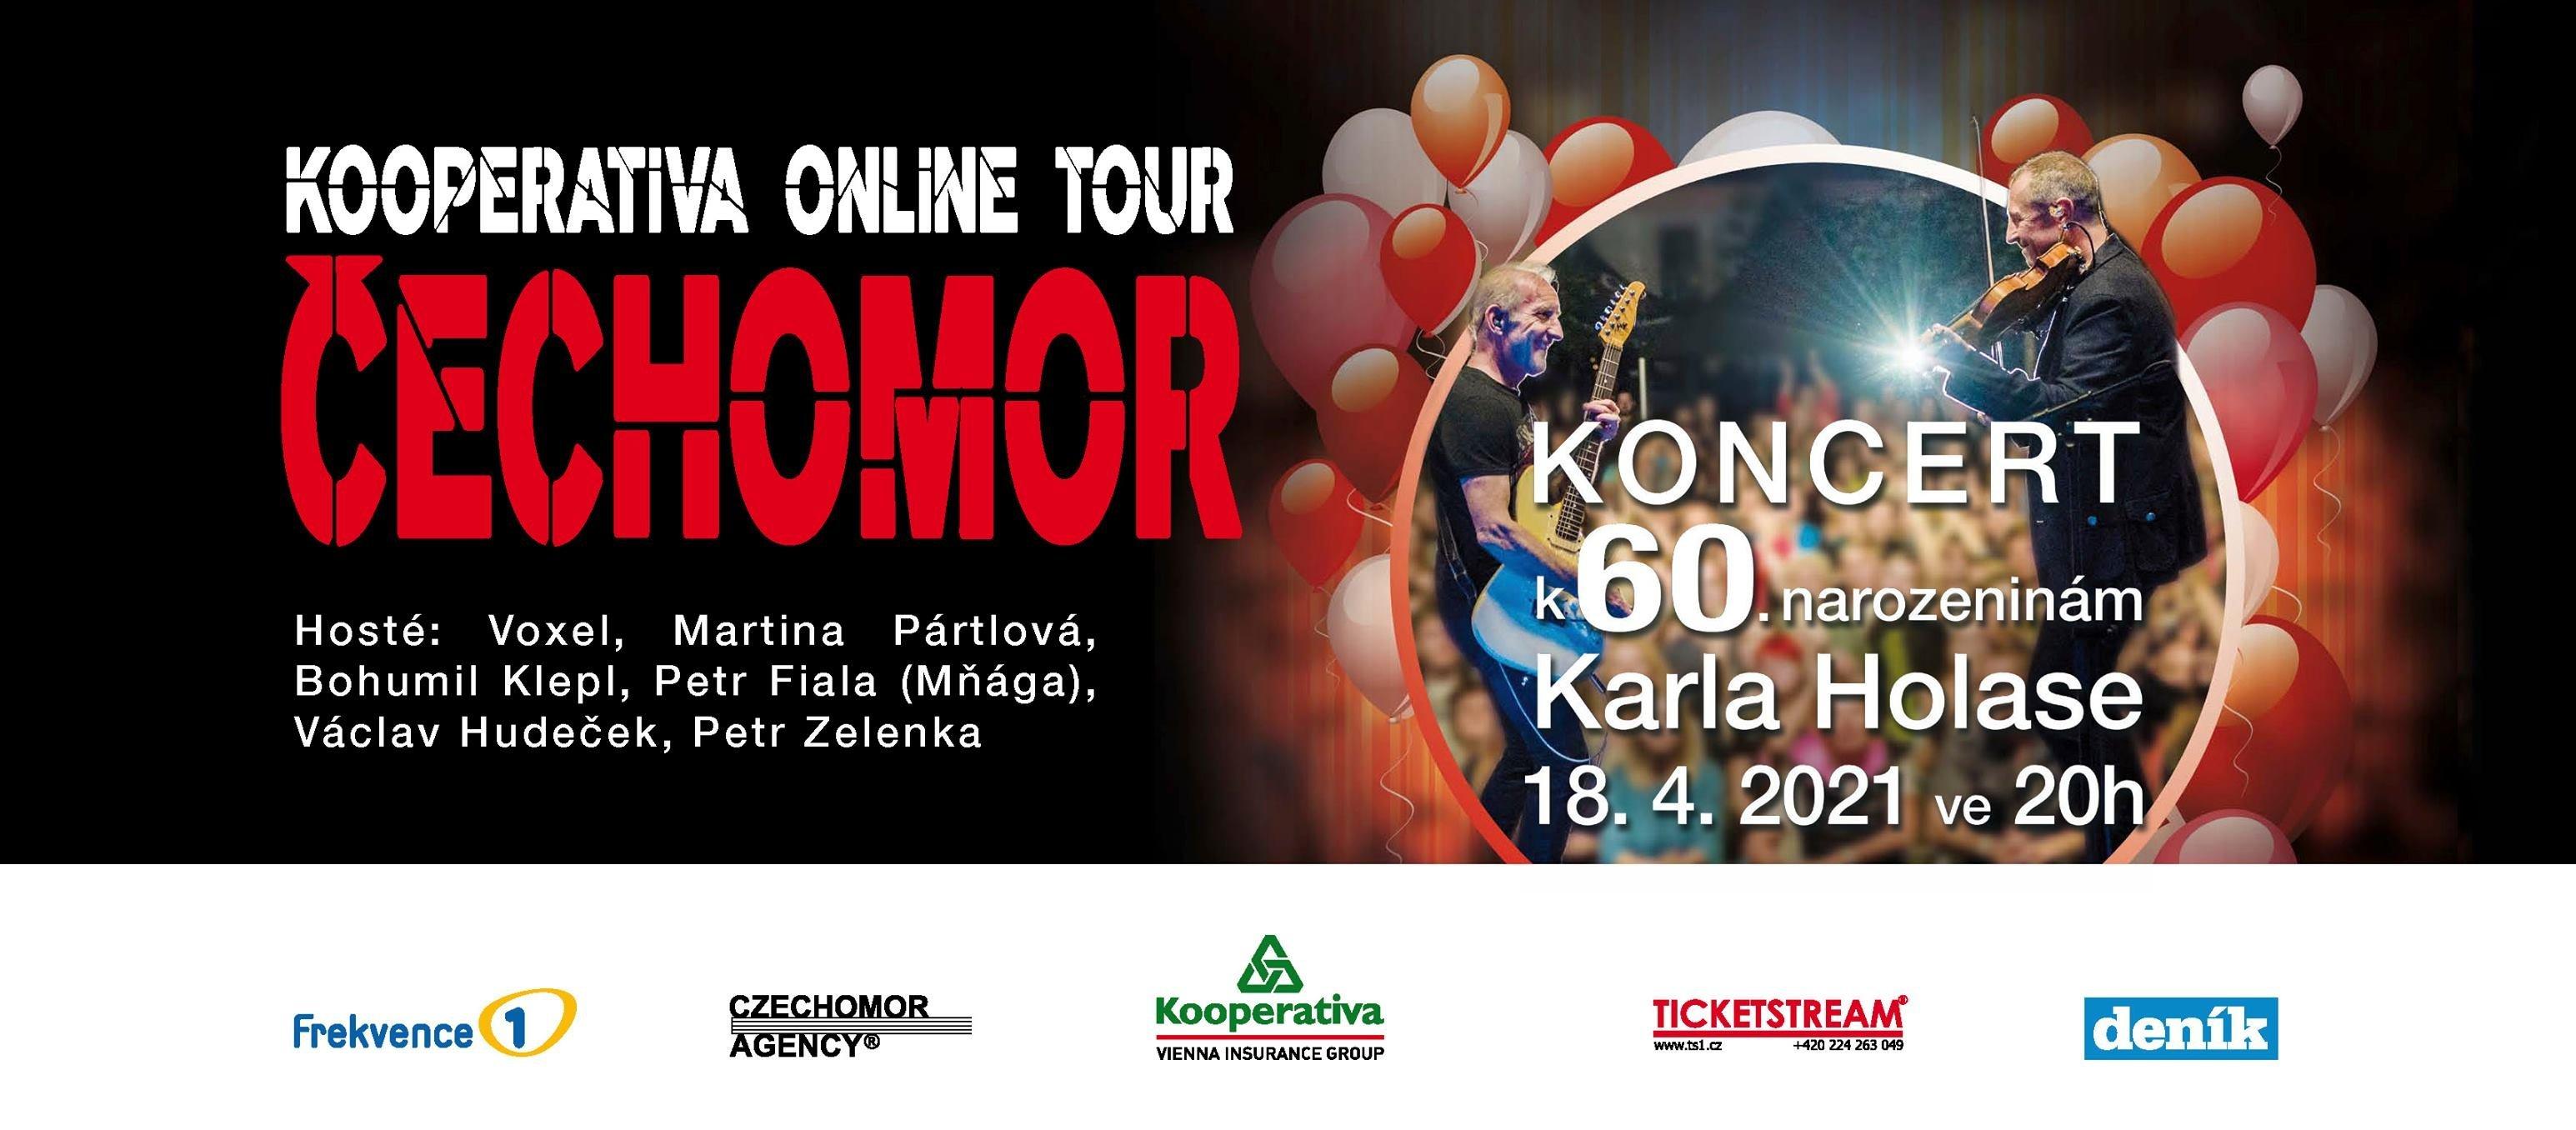 Čechomor Online Concert